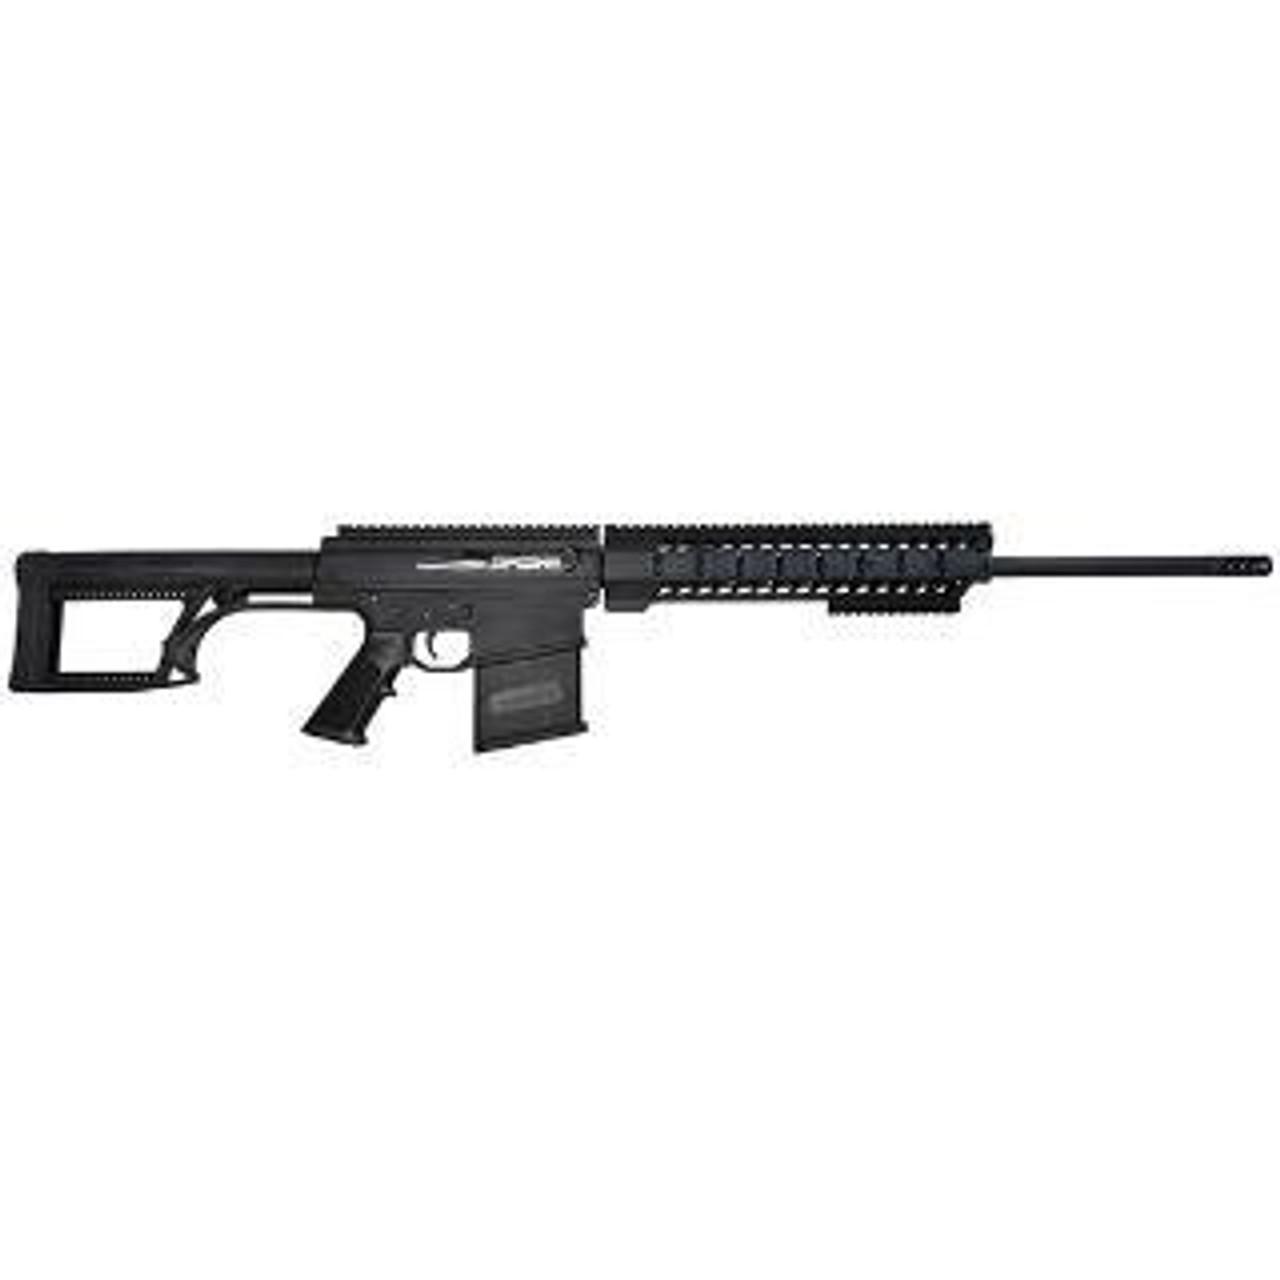 Noreen BN36 Long Range Assassin .30-06 - California Legal